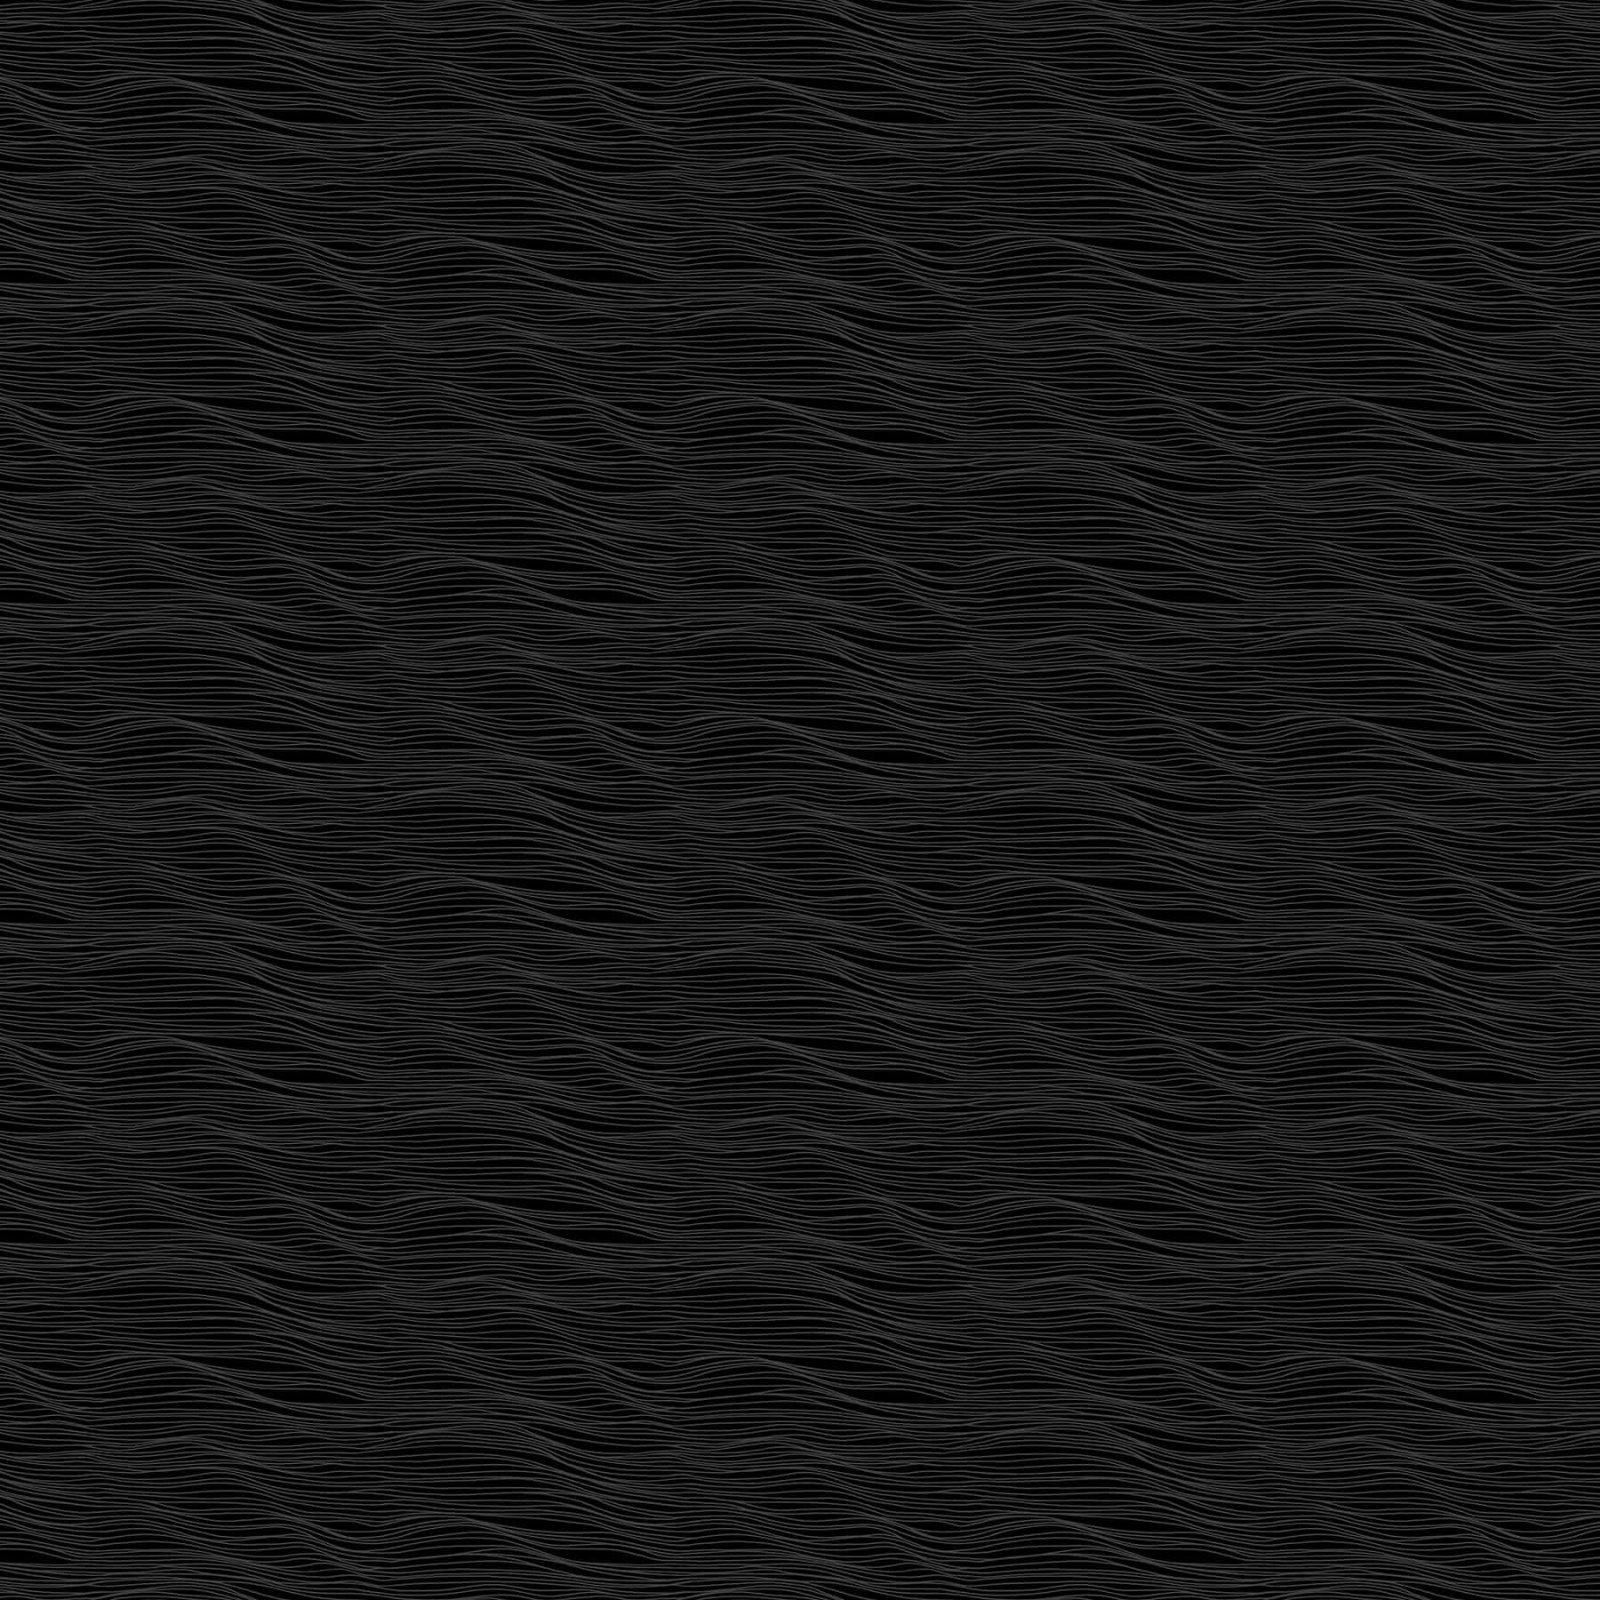 Elements by Ghazal Razavi - Water - Black